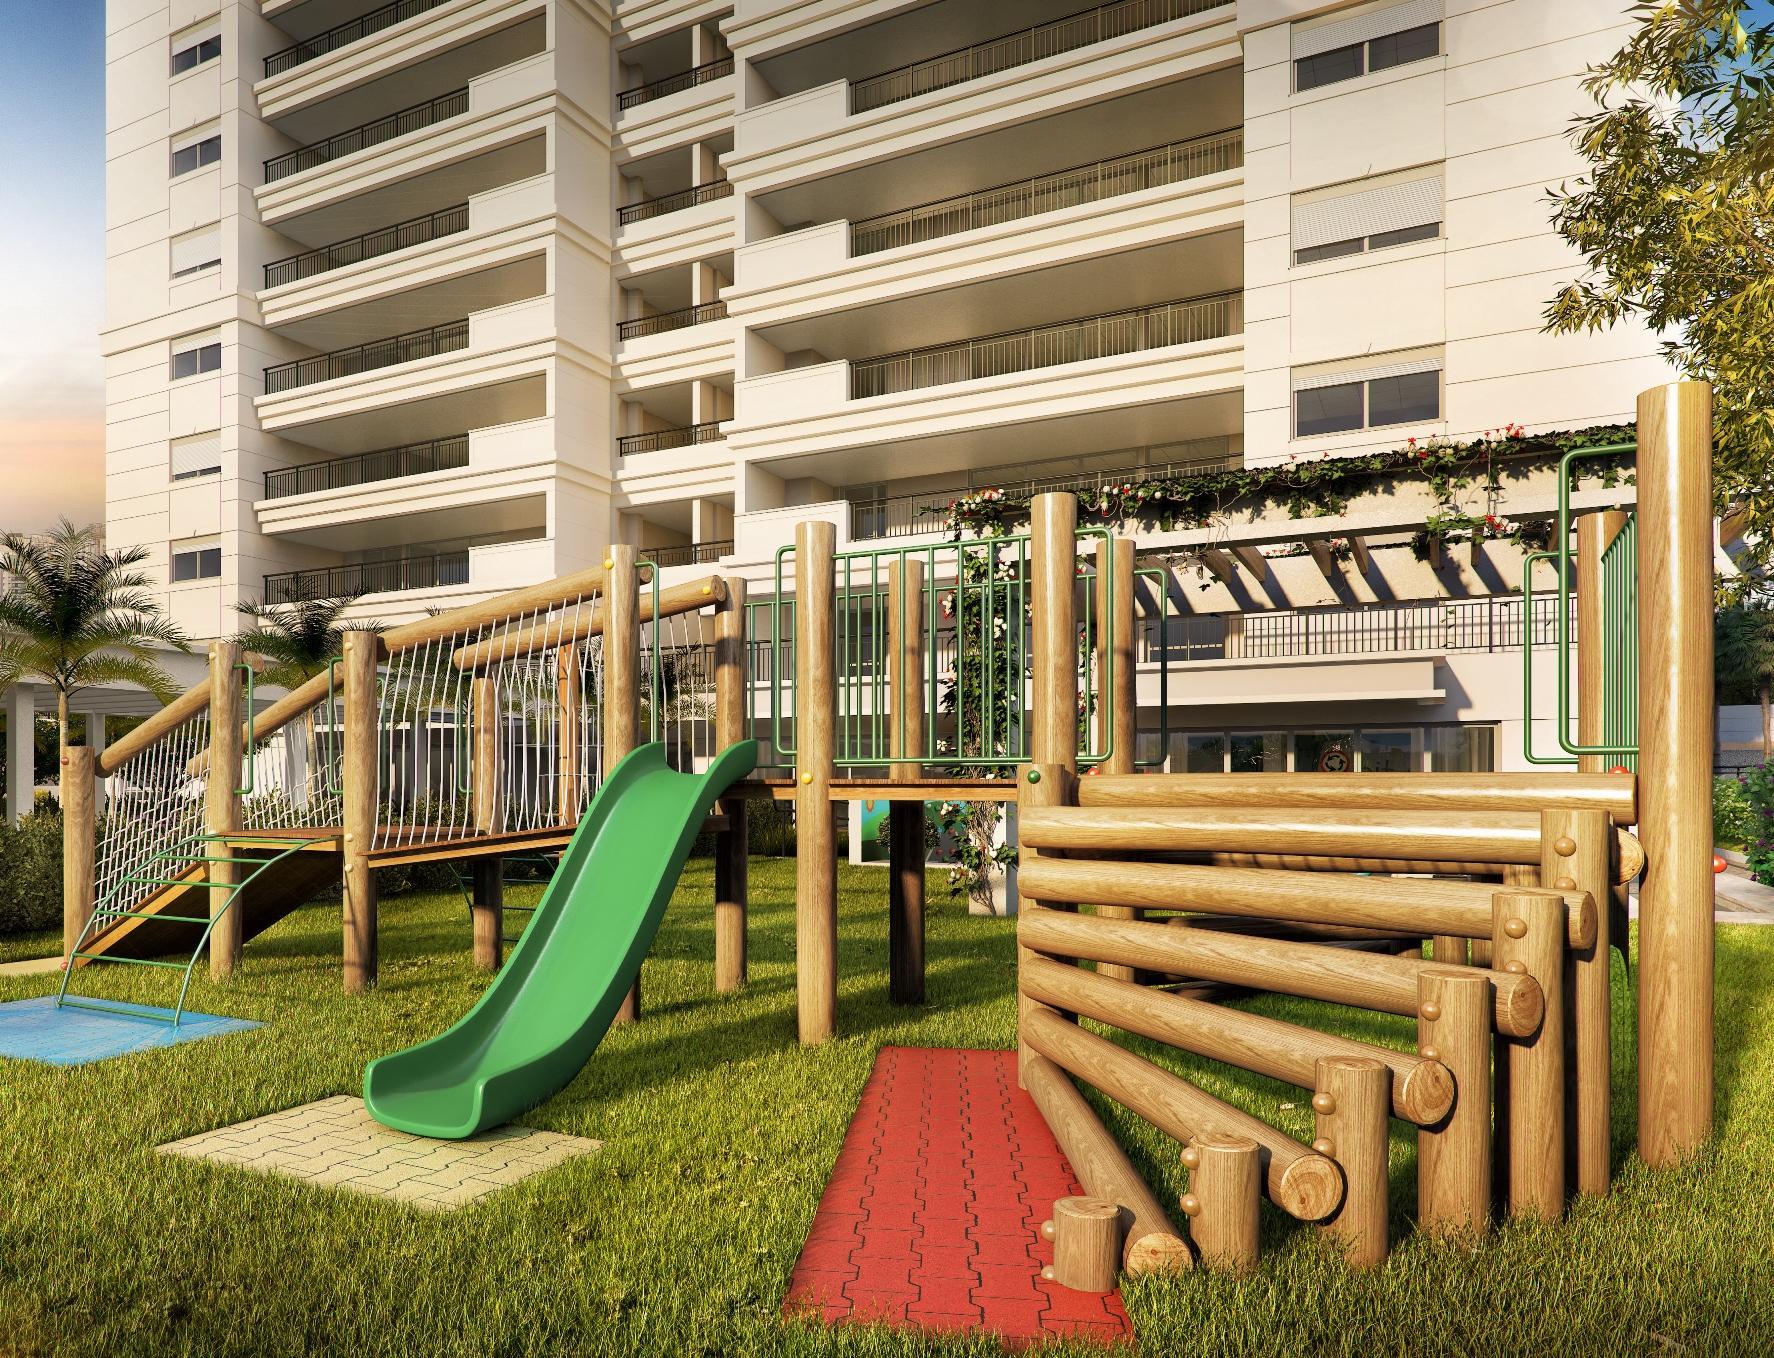 perspectiva-ilustrada-do-playground